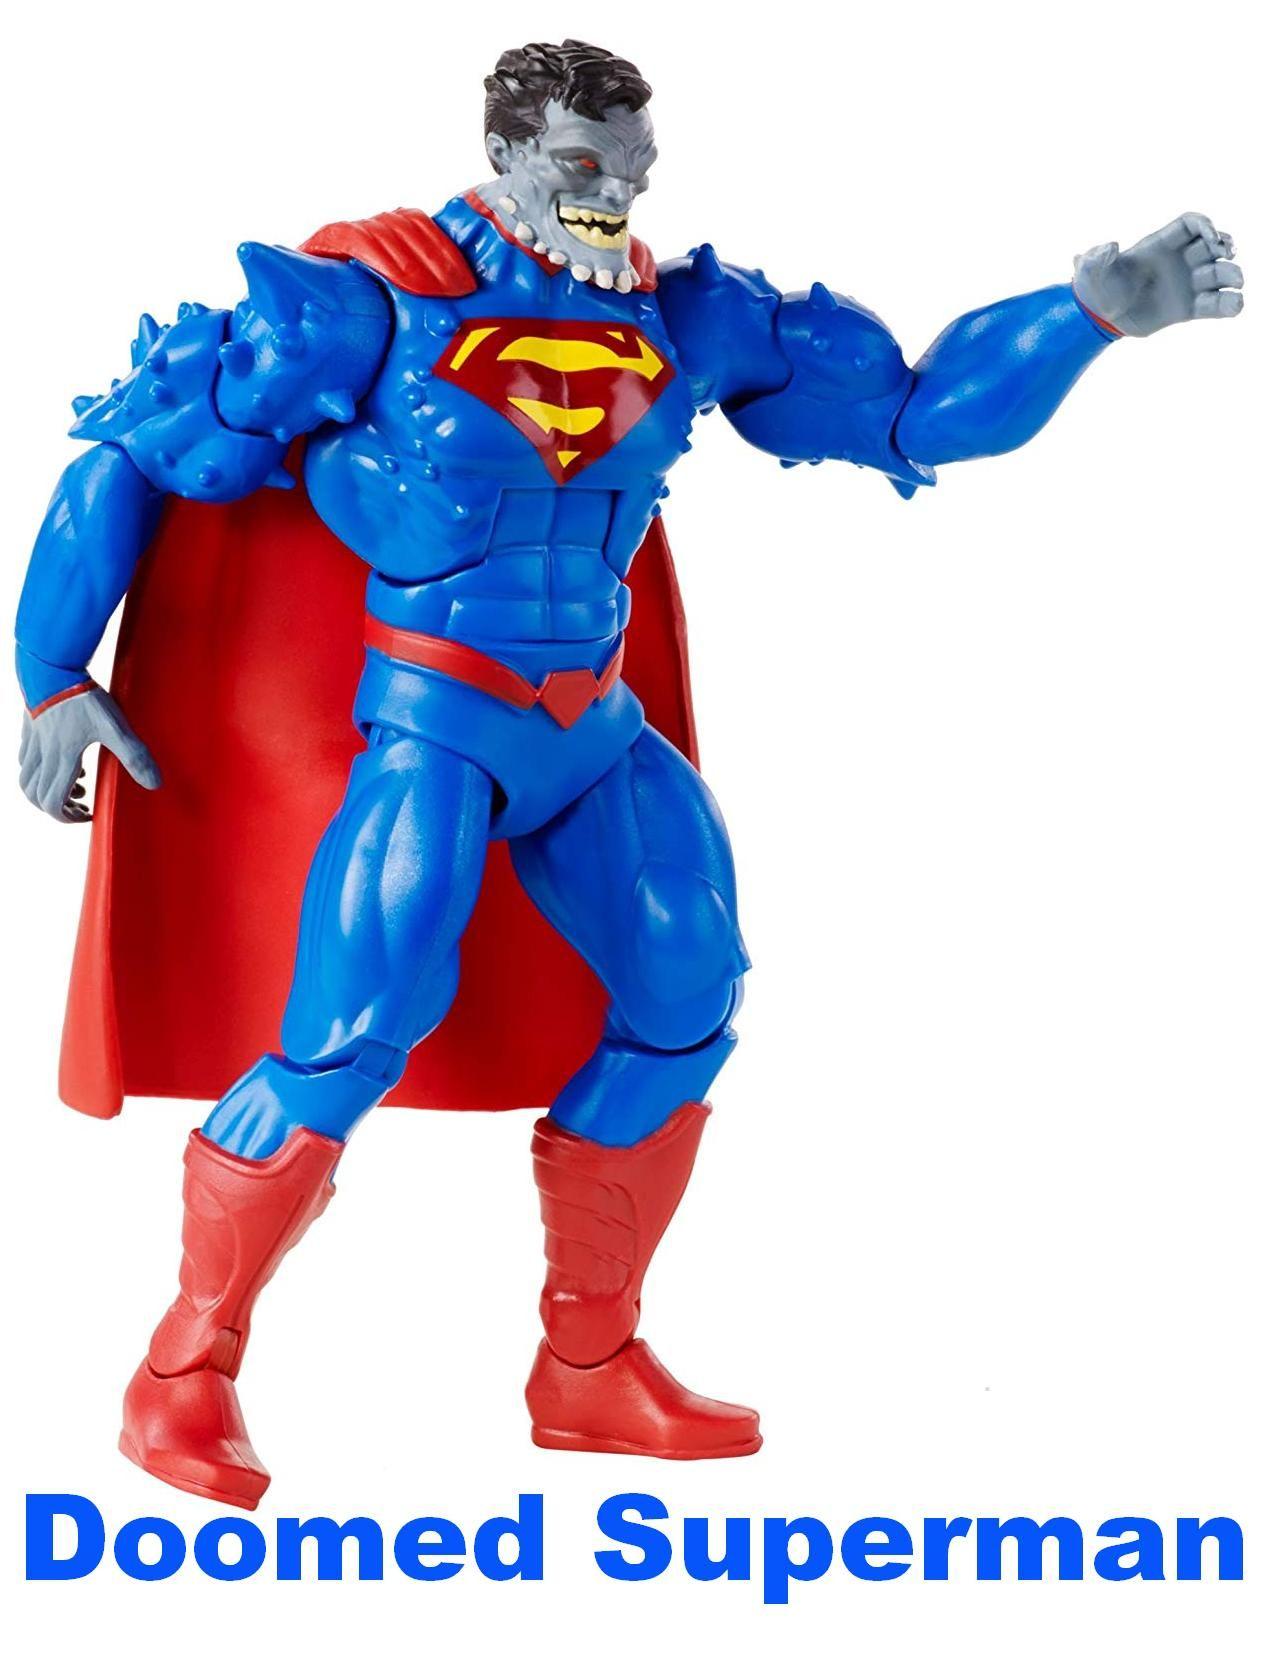 Dc Doomed Superman Action Figure By Mattel Dc Comics Multiverse